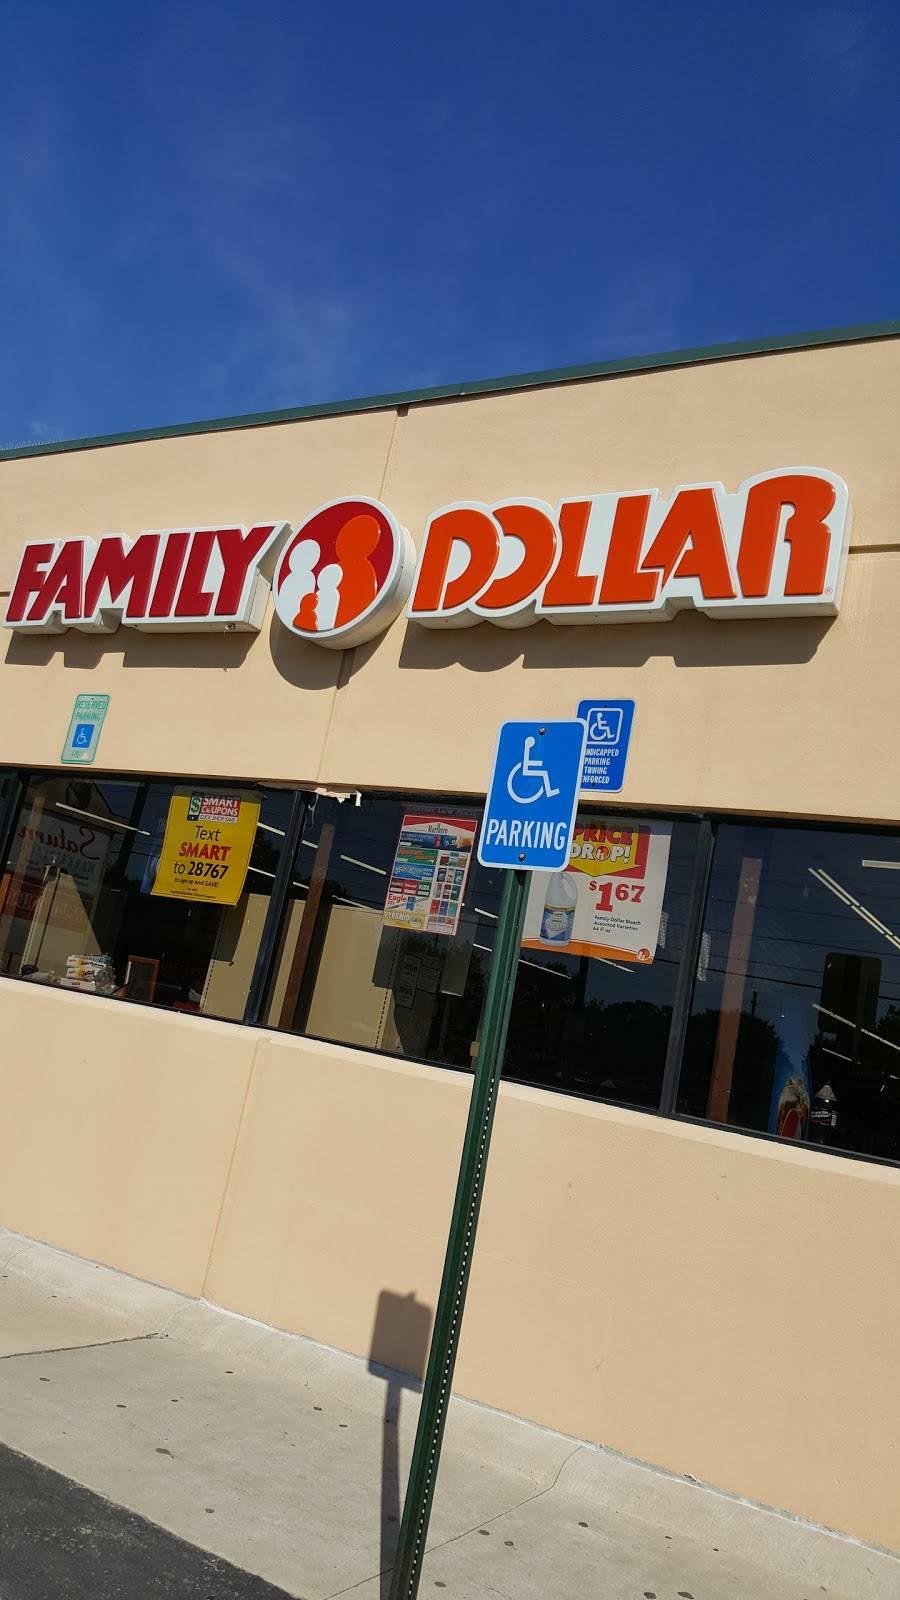 Family Dollar - supermarket  | Photo 1 of 3 | Address: 25190 Van Born Rd, Dearborn Heights, MI 48125, USA | Phone: (313) 203-1257